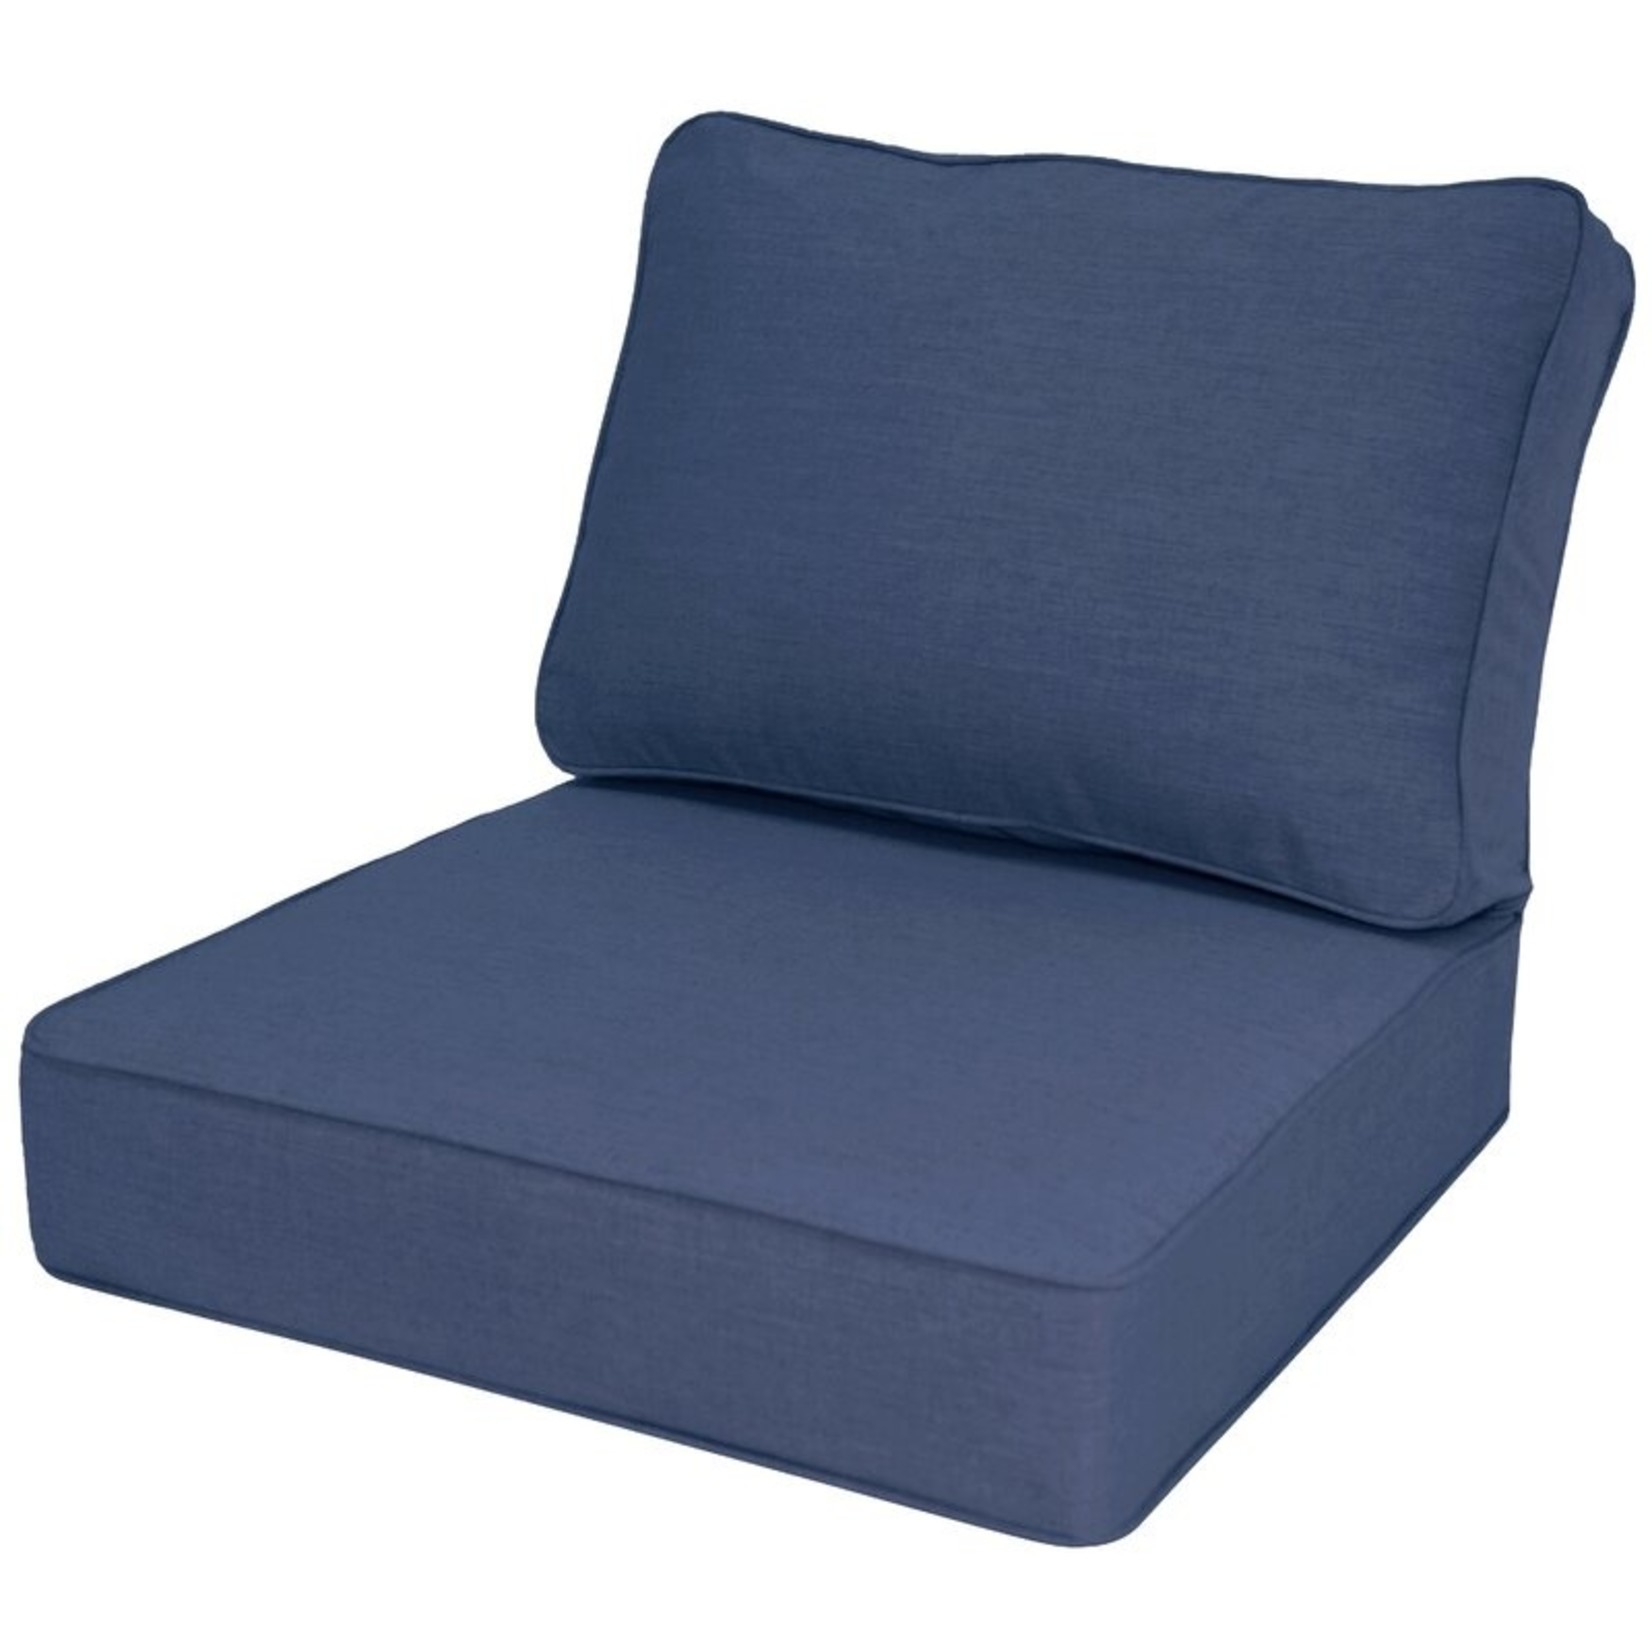 *Outdoor Sunbrella Seat/Back Cushion - Navy